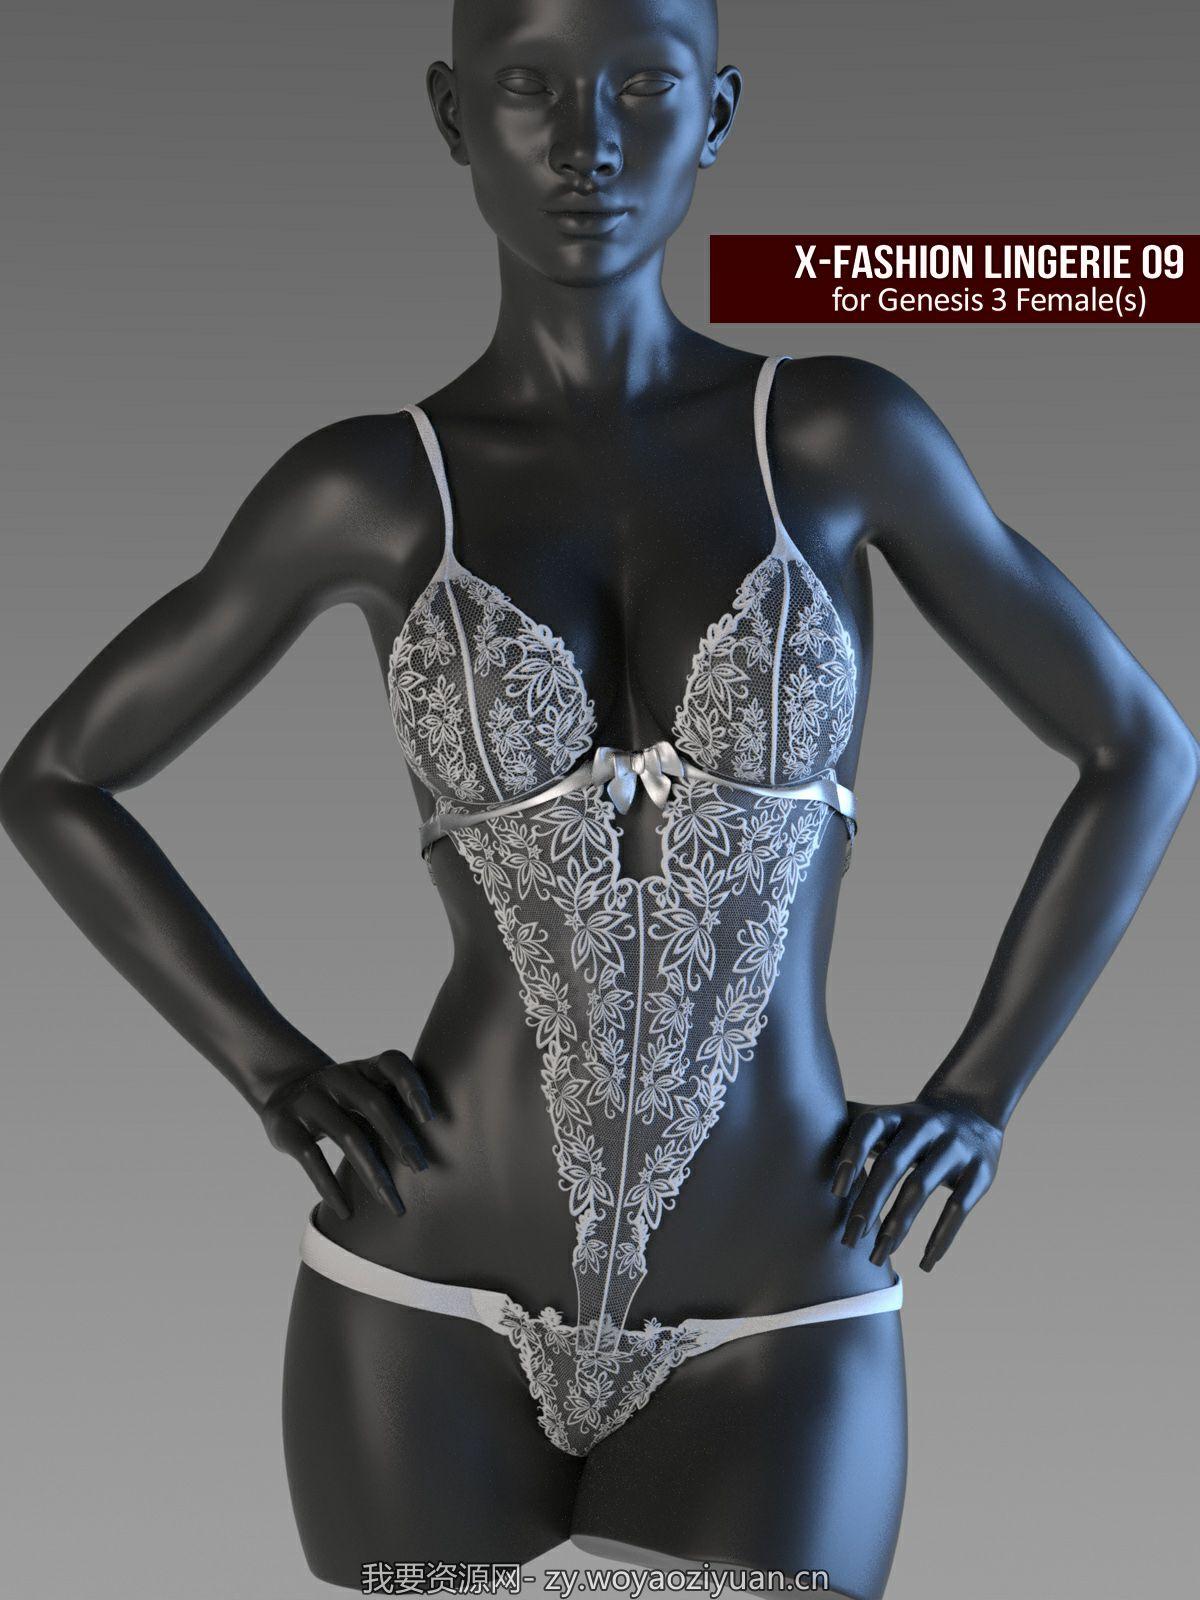 X-Fashion Lingerie 9 for Genesis 3 Females